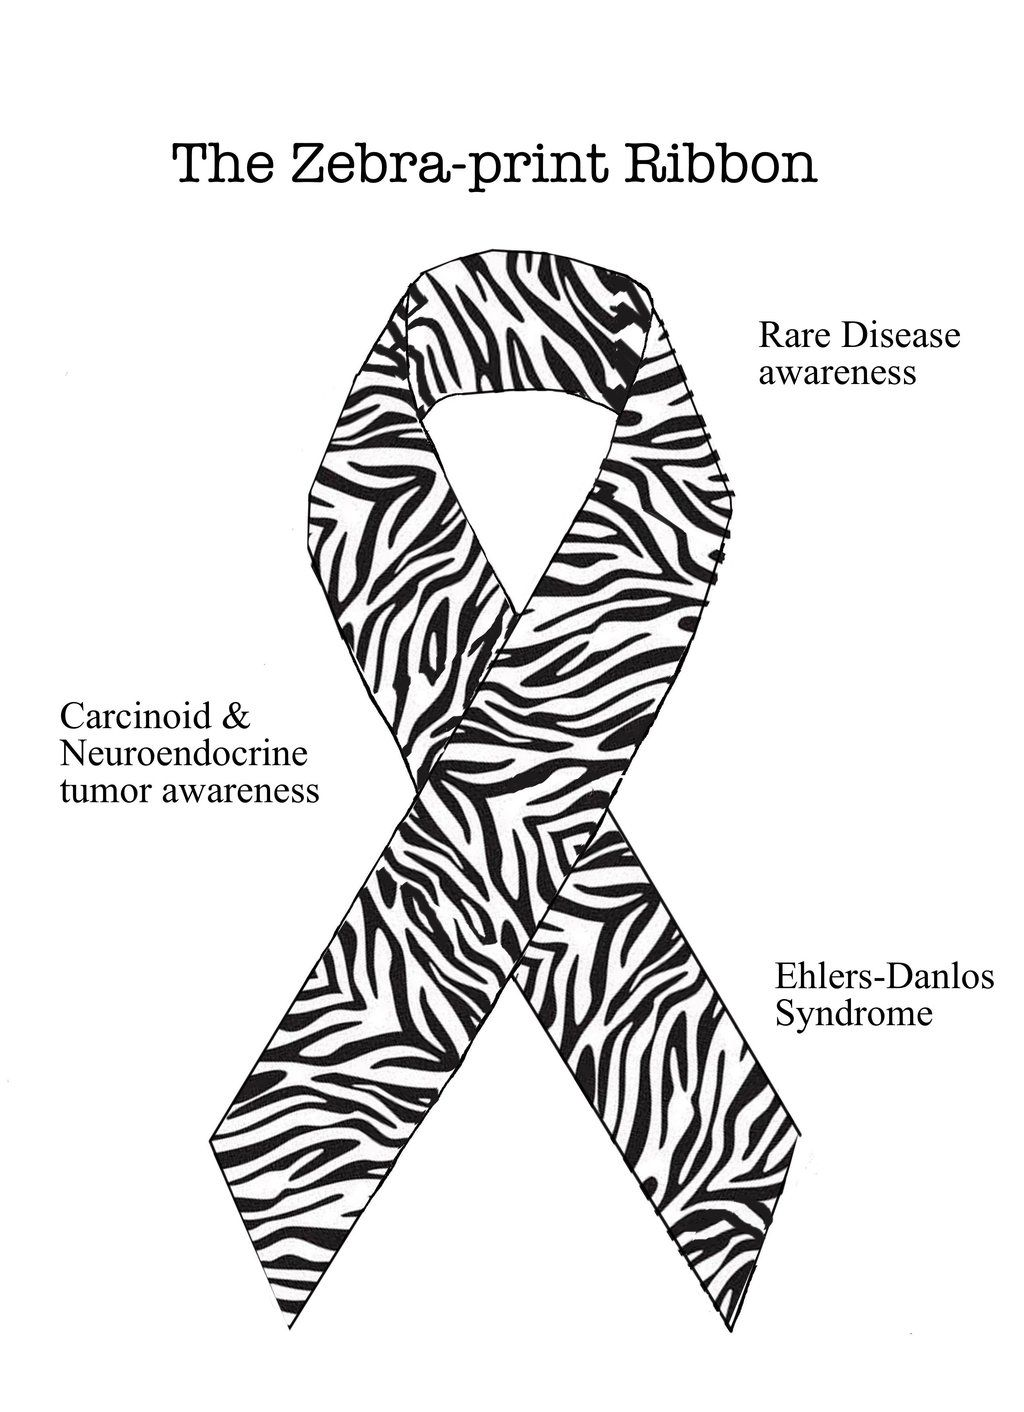 zebra ribbon rare disease awareness we get zebra pins every